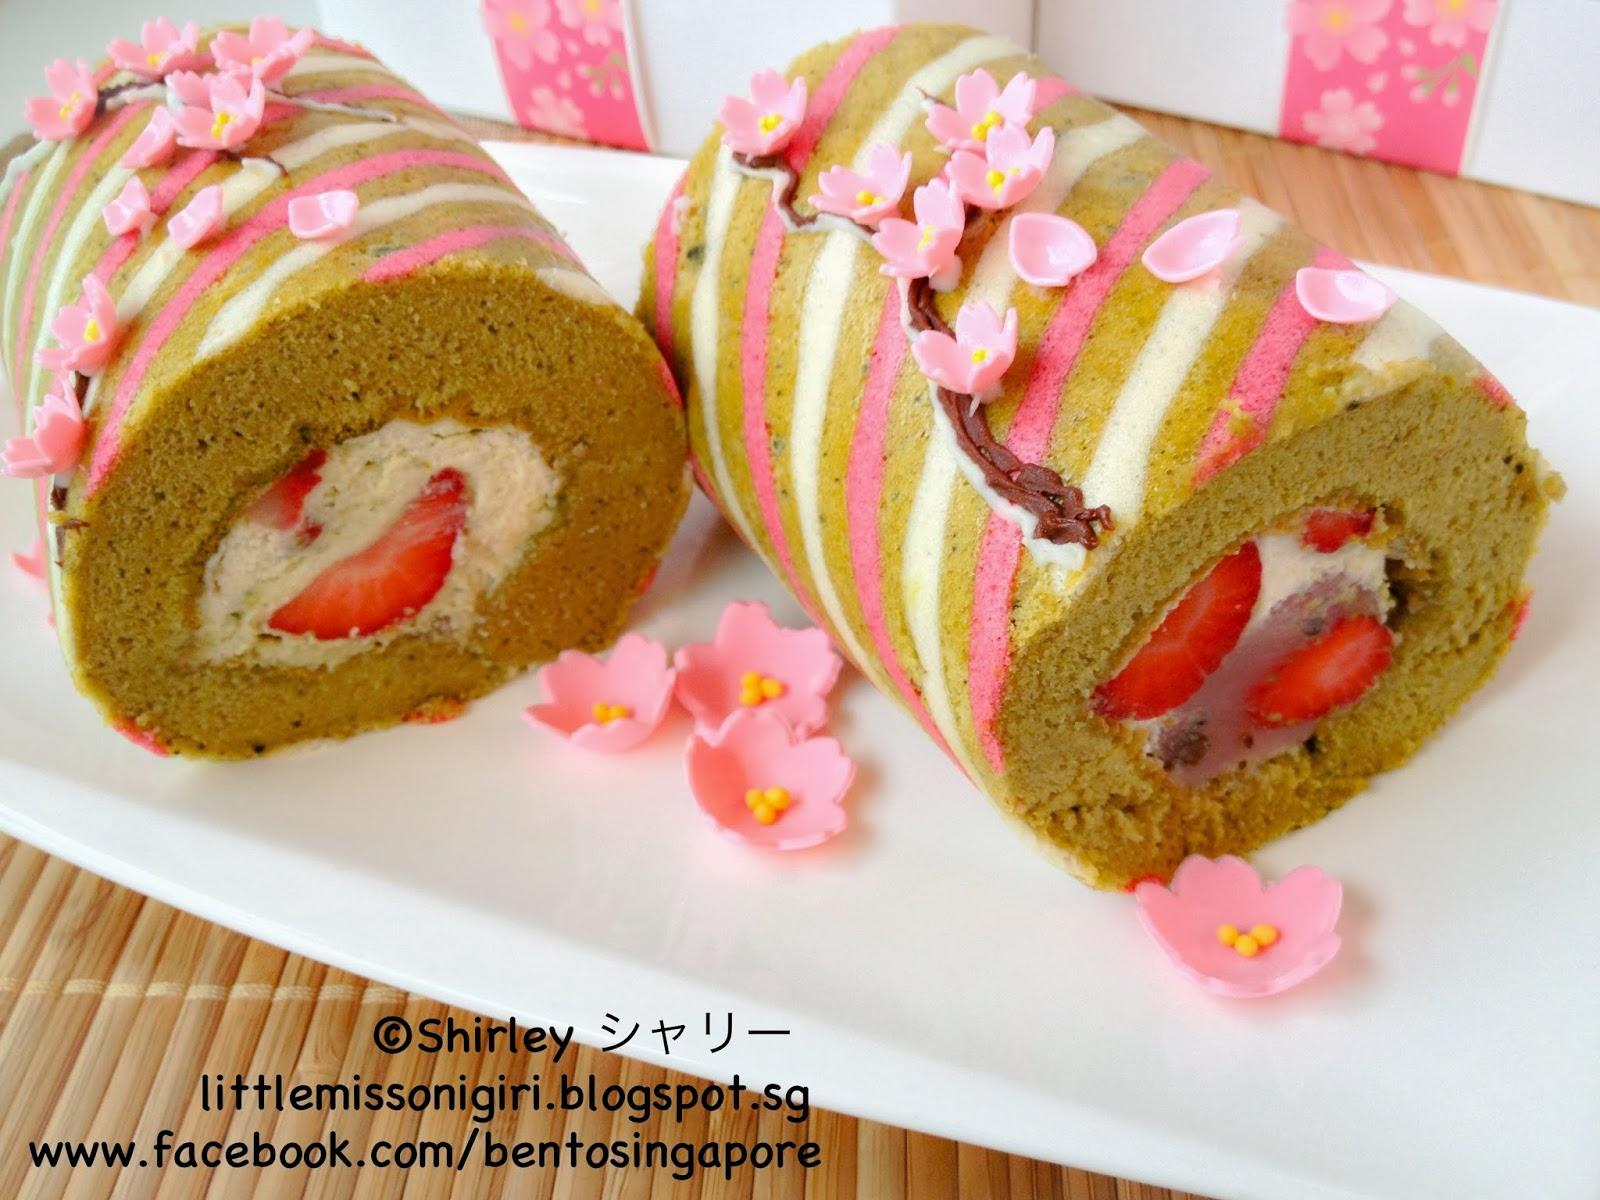 Strawberry Roll Cake Japanese Recipe: Sakura Matcha Deco Roll Cake 桜の抹茶デコロールケーキ